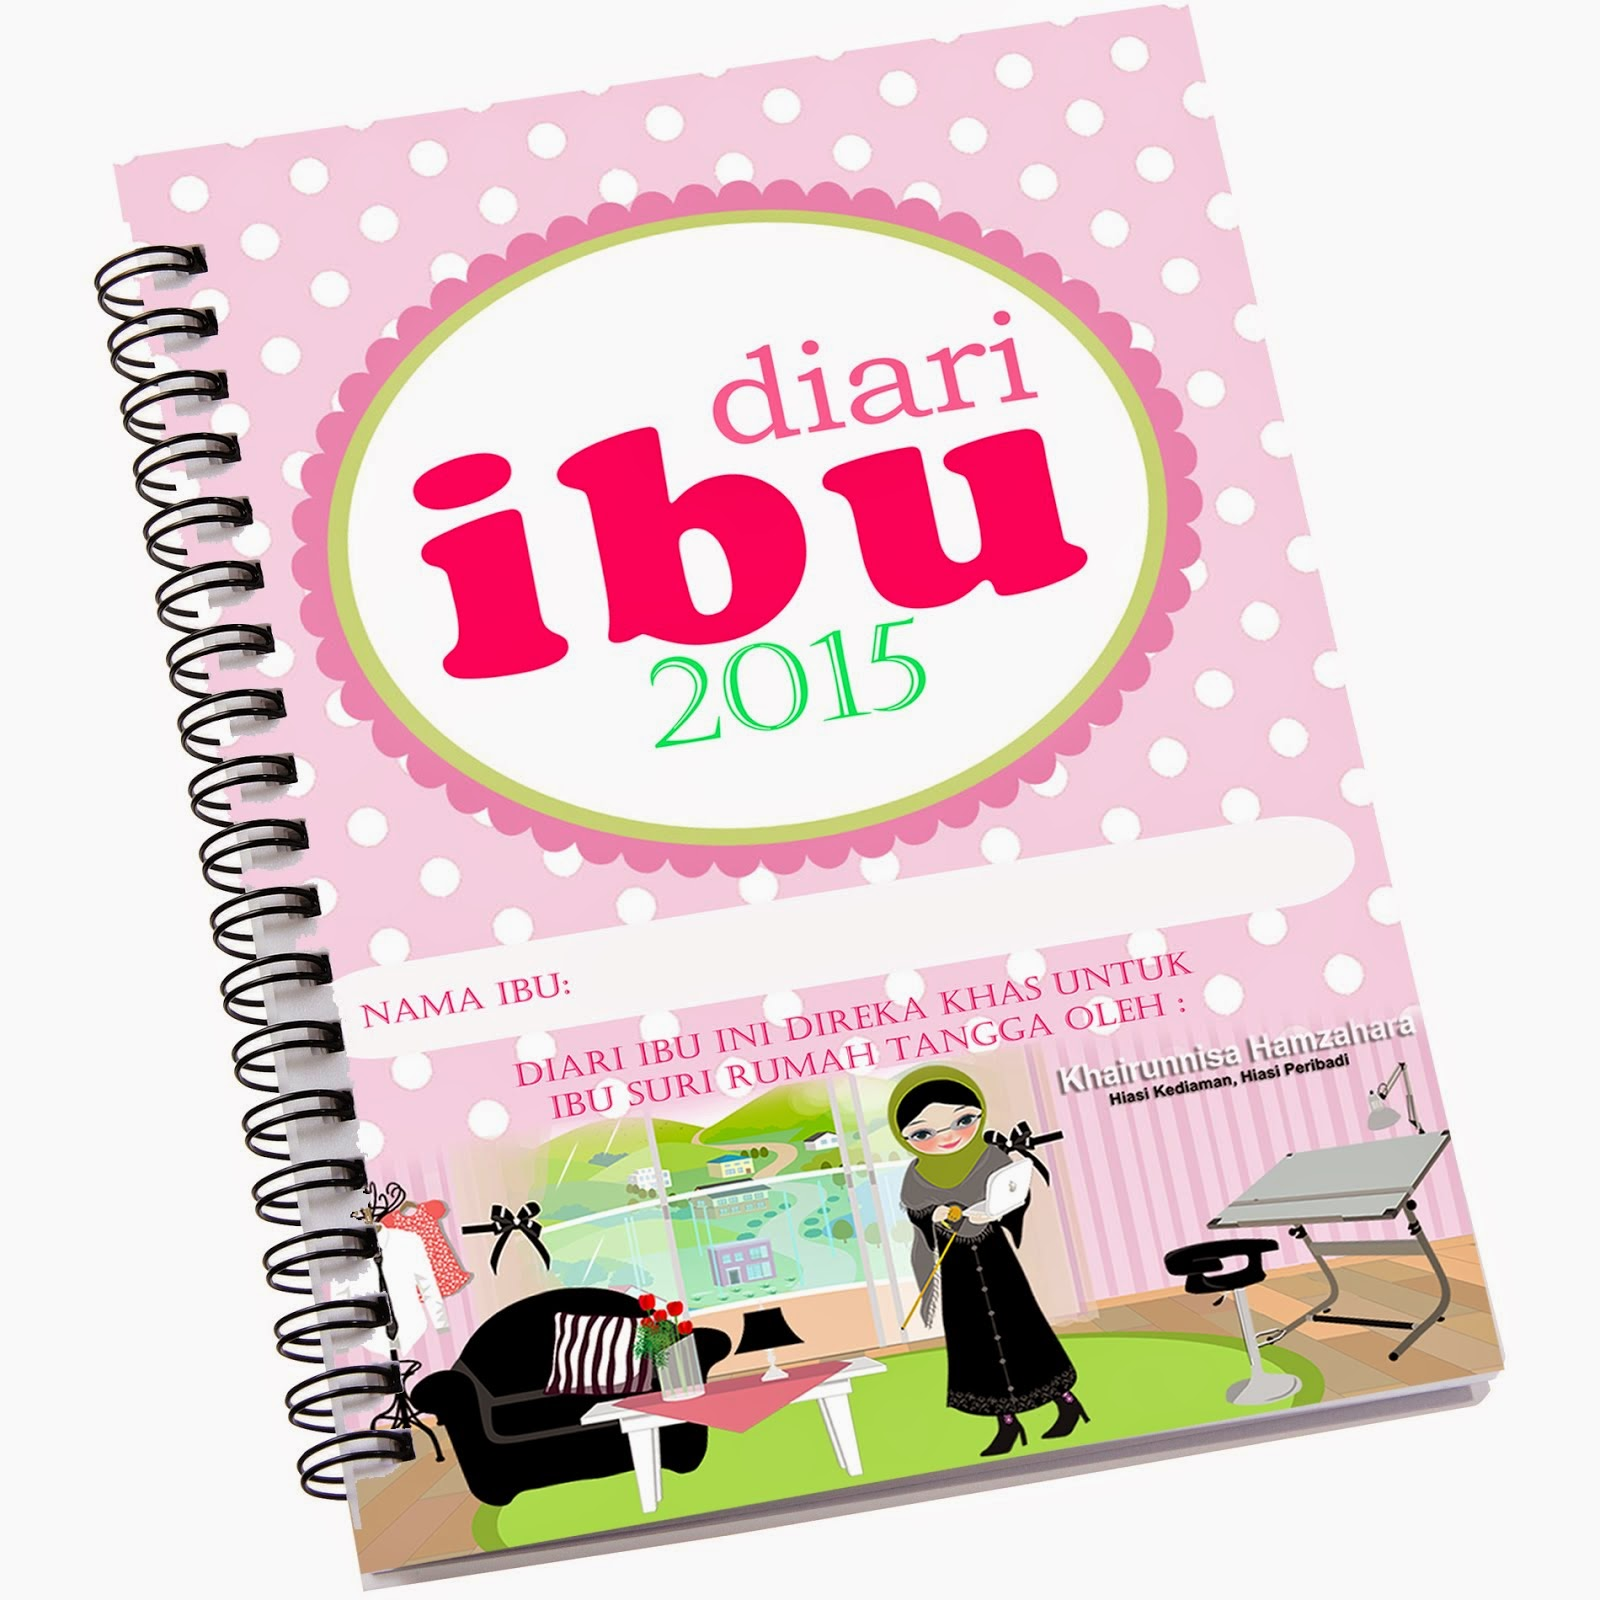 DIARI IBU 2015 (MOM PLANNER BERCIRIKAN ISLAMIK)